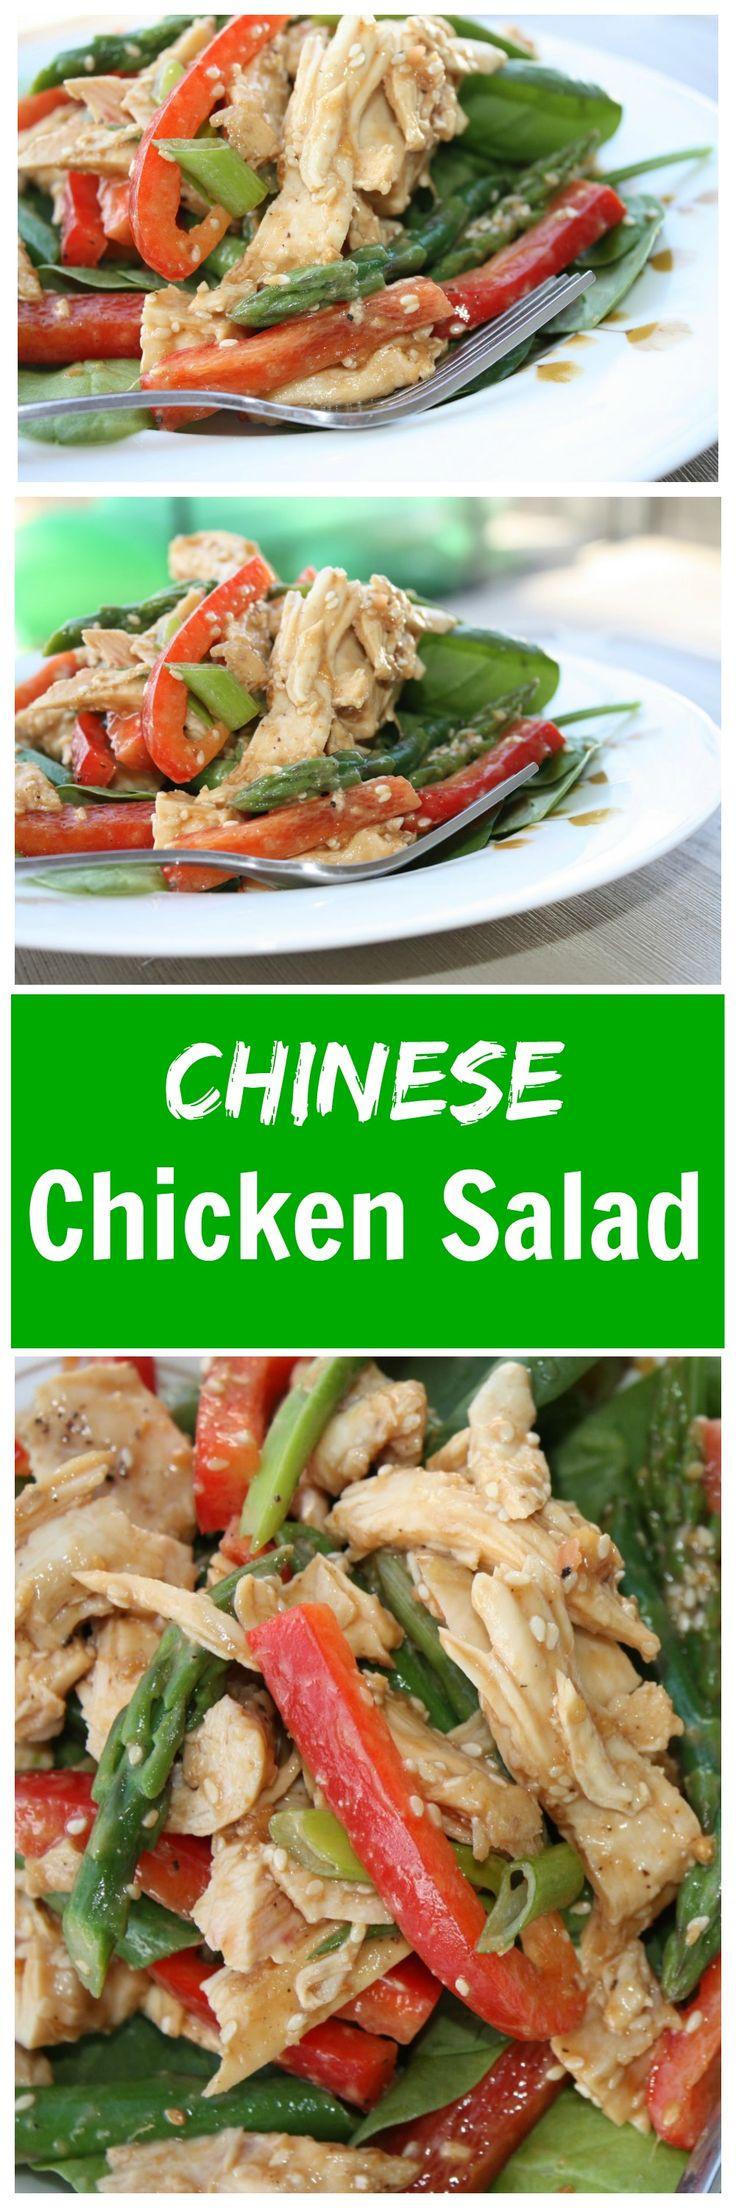 Barefoot Contessa Salad Recipes 25+ best ideas about ina garten chicken salad on pinterest | food